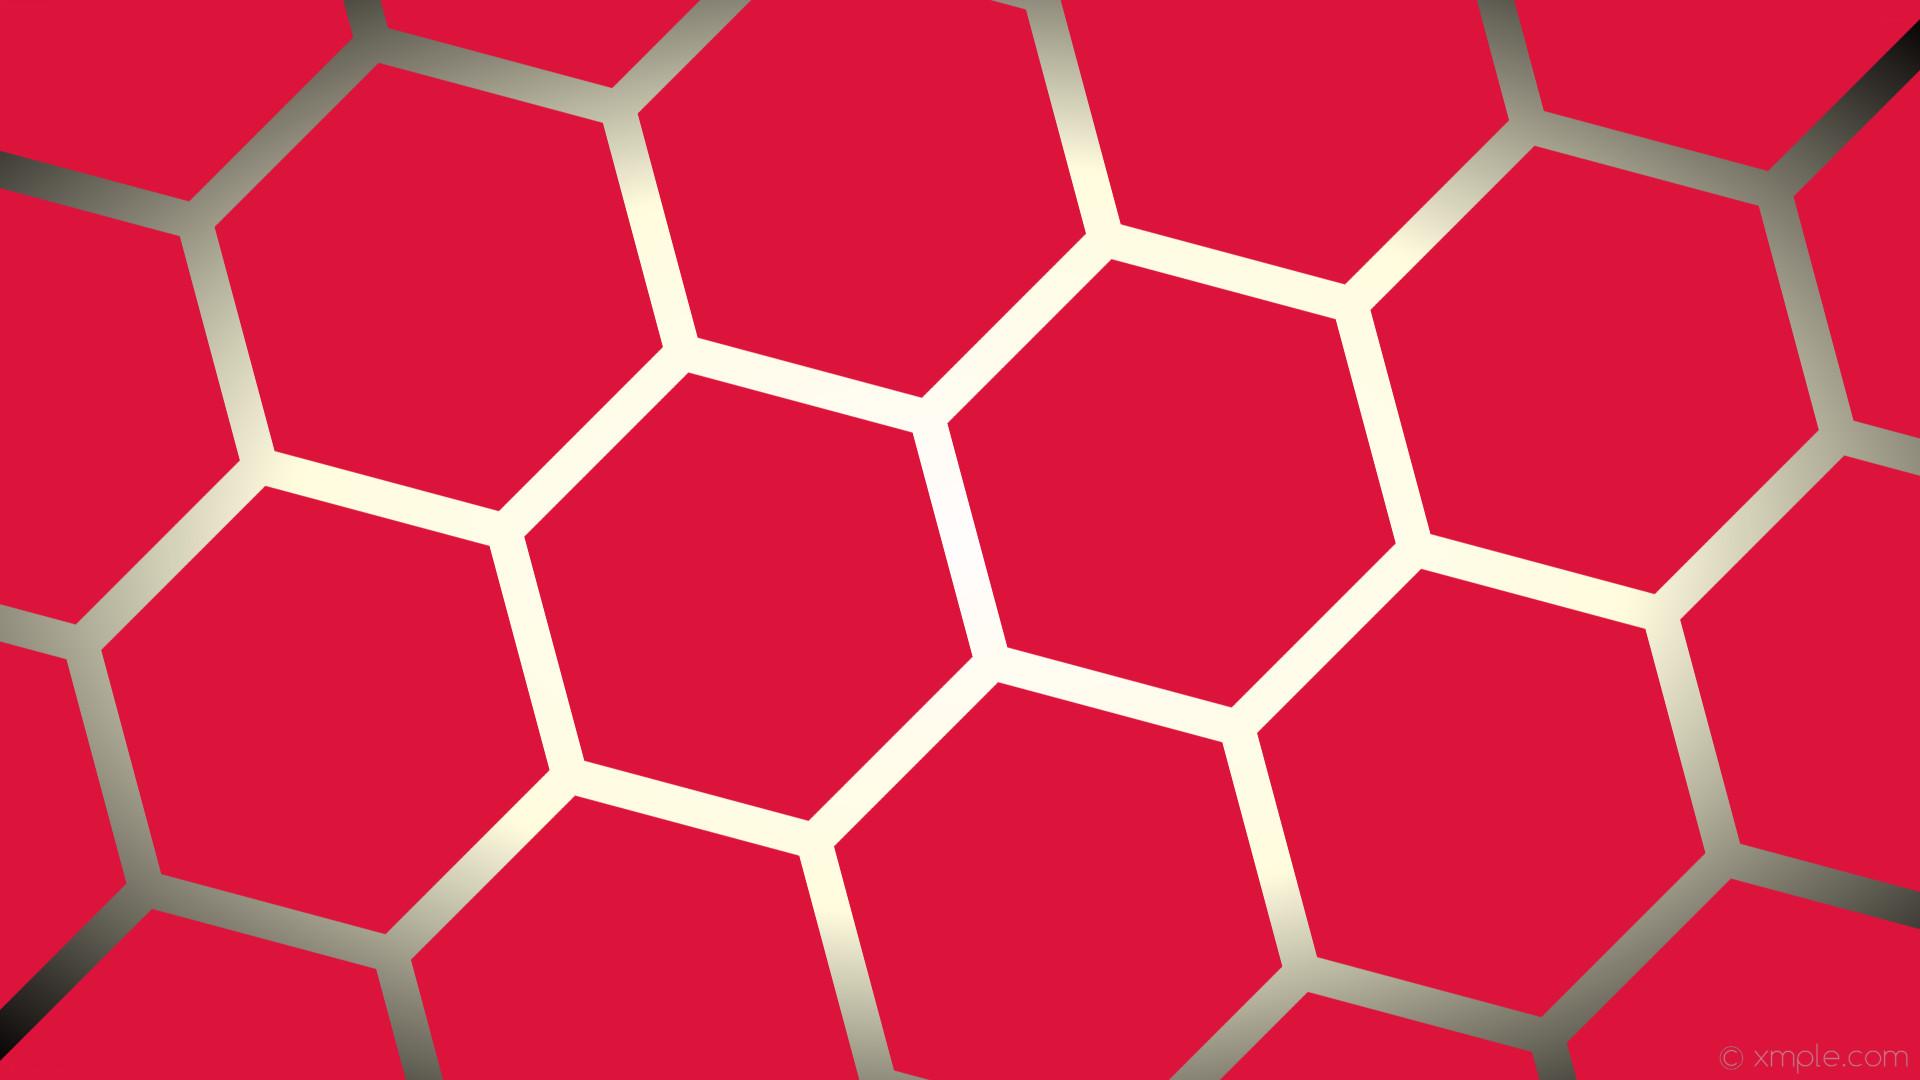 wallpaper red white gradient yellow hexagon glow black crimson light yellow  #dc143c #ffffff #